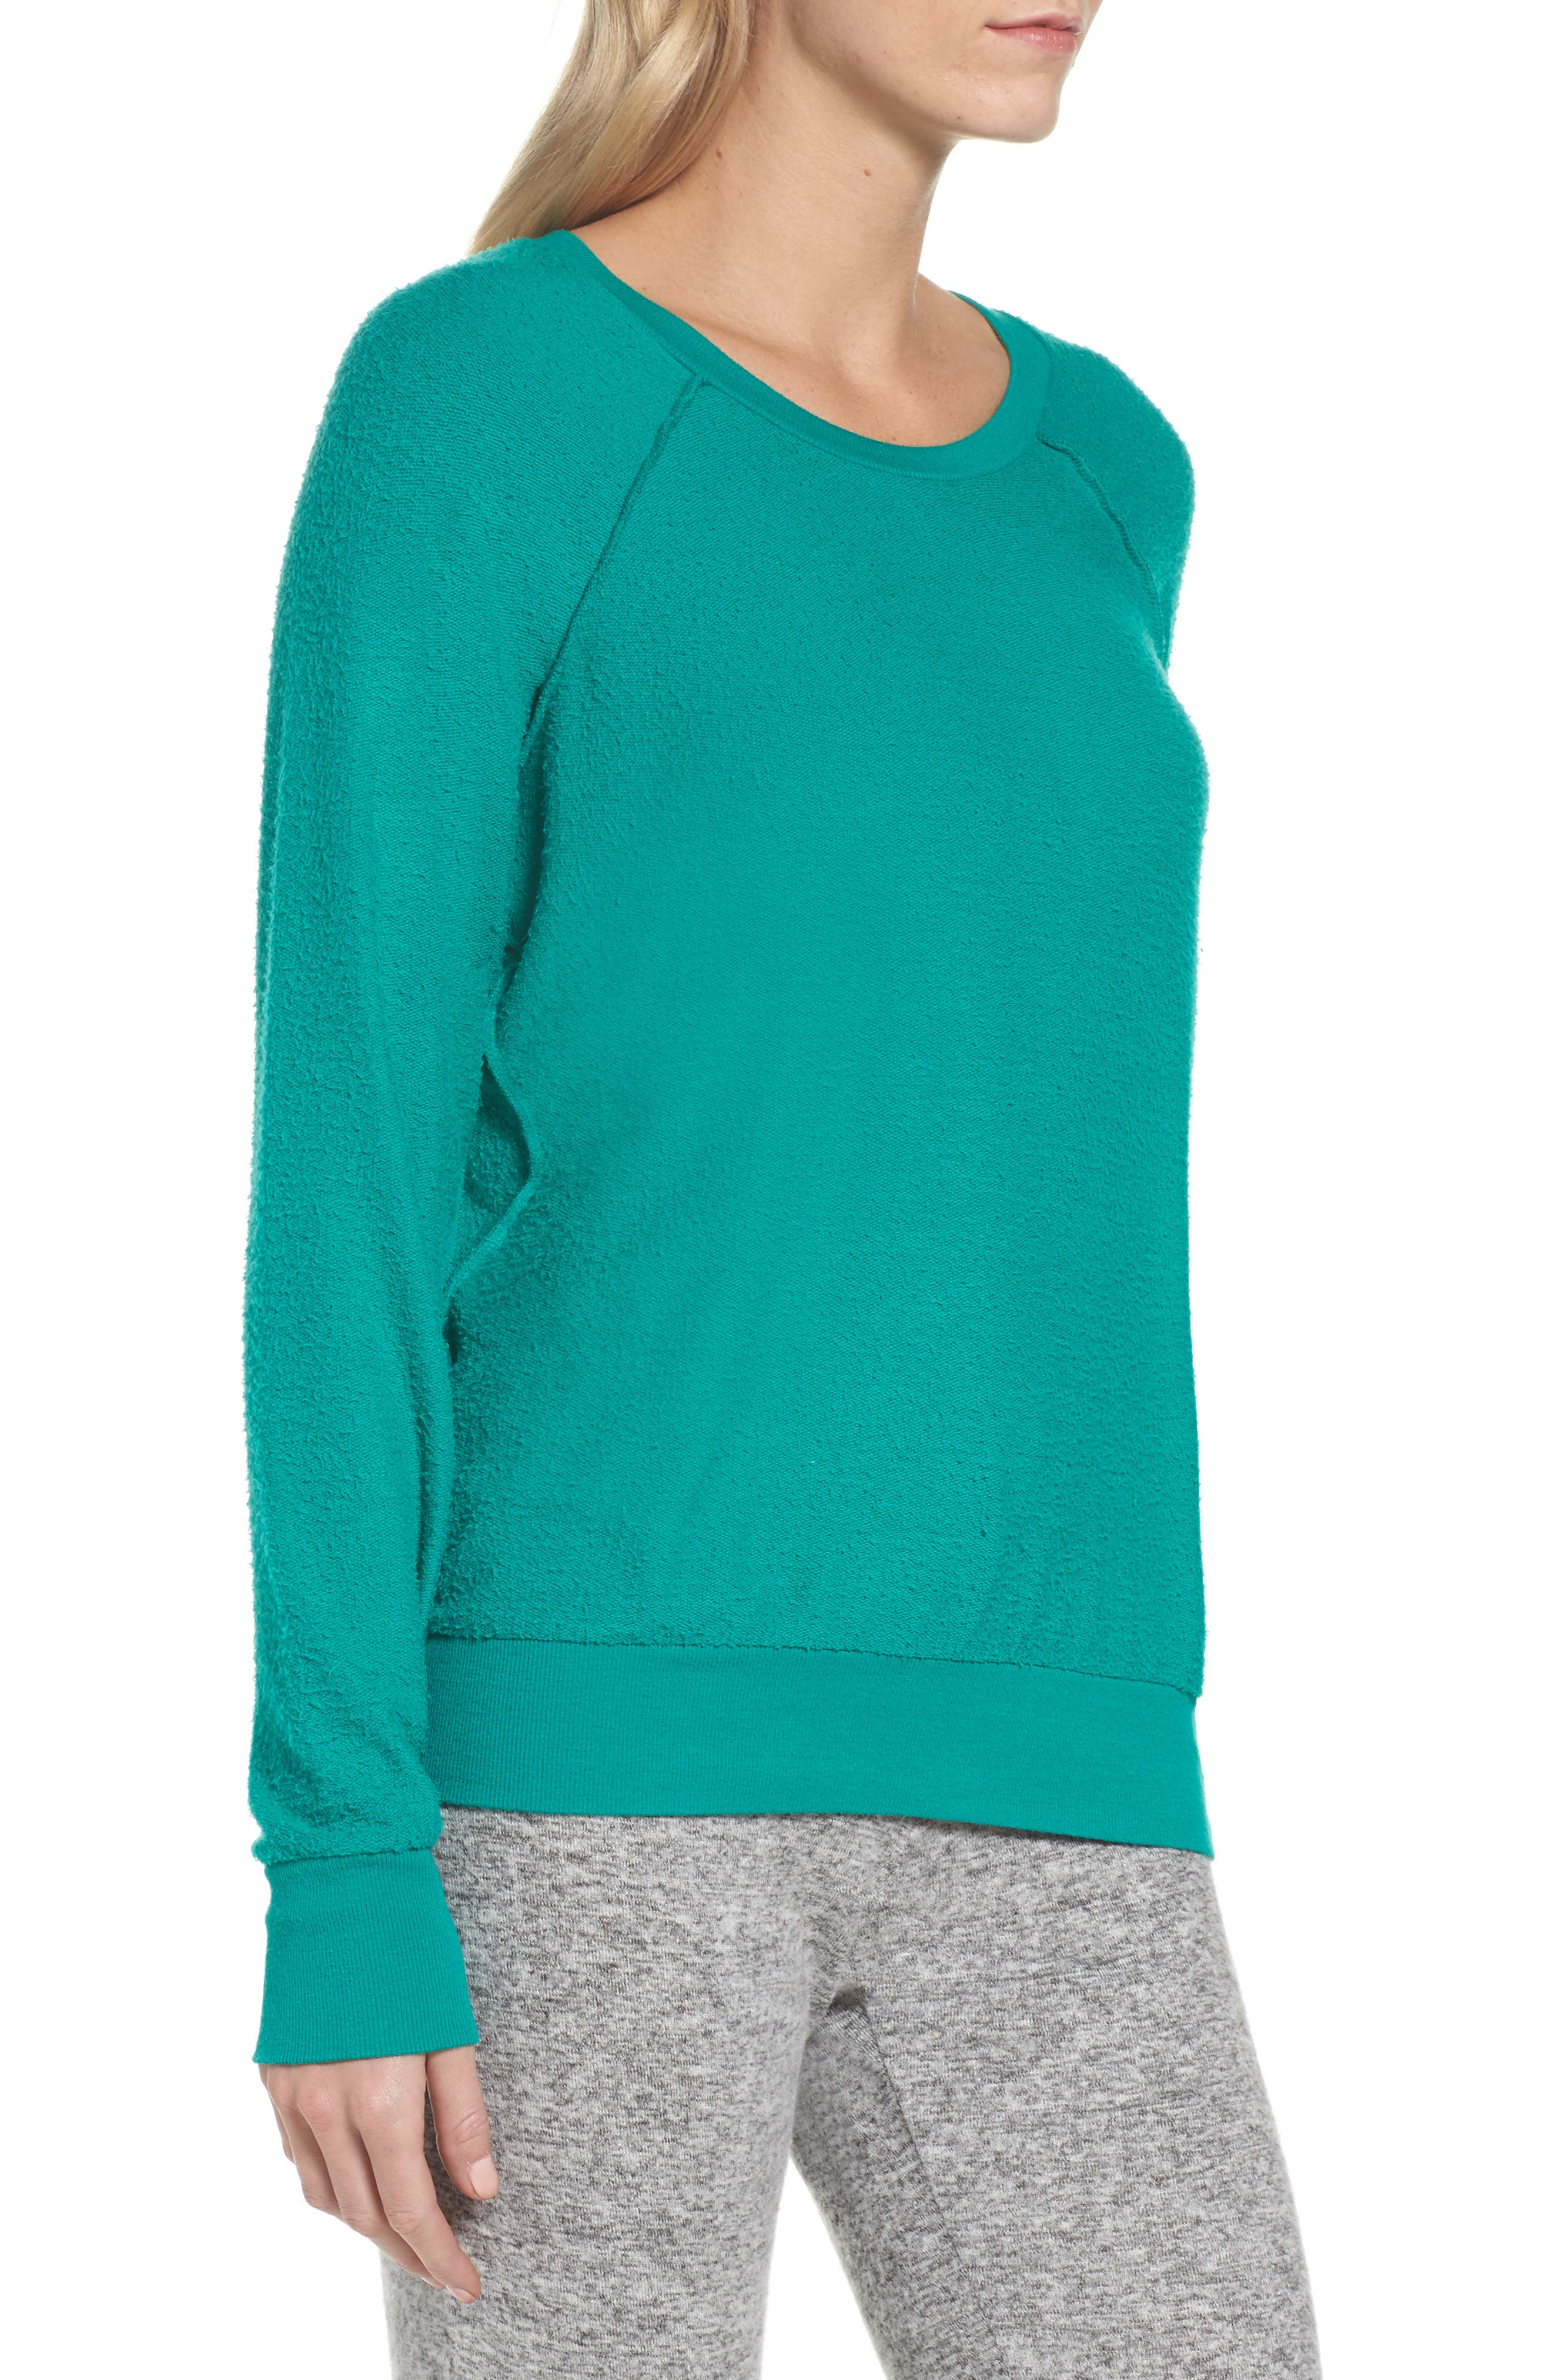 Edge Sweatshirt,                             Alternate thumbnail 3, color,                             Kelly